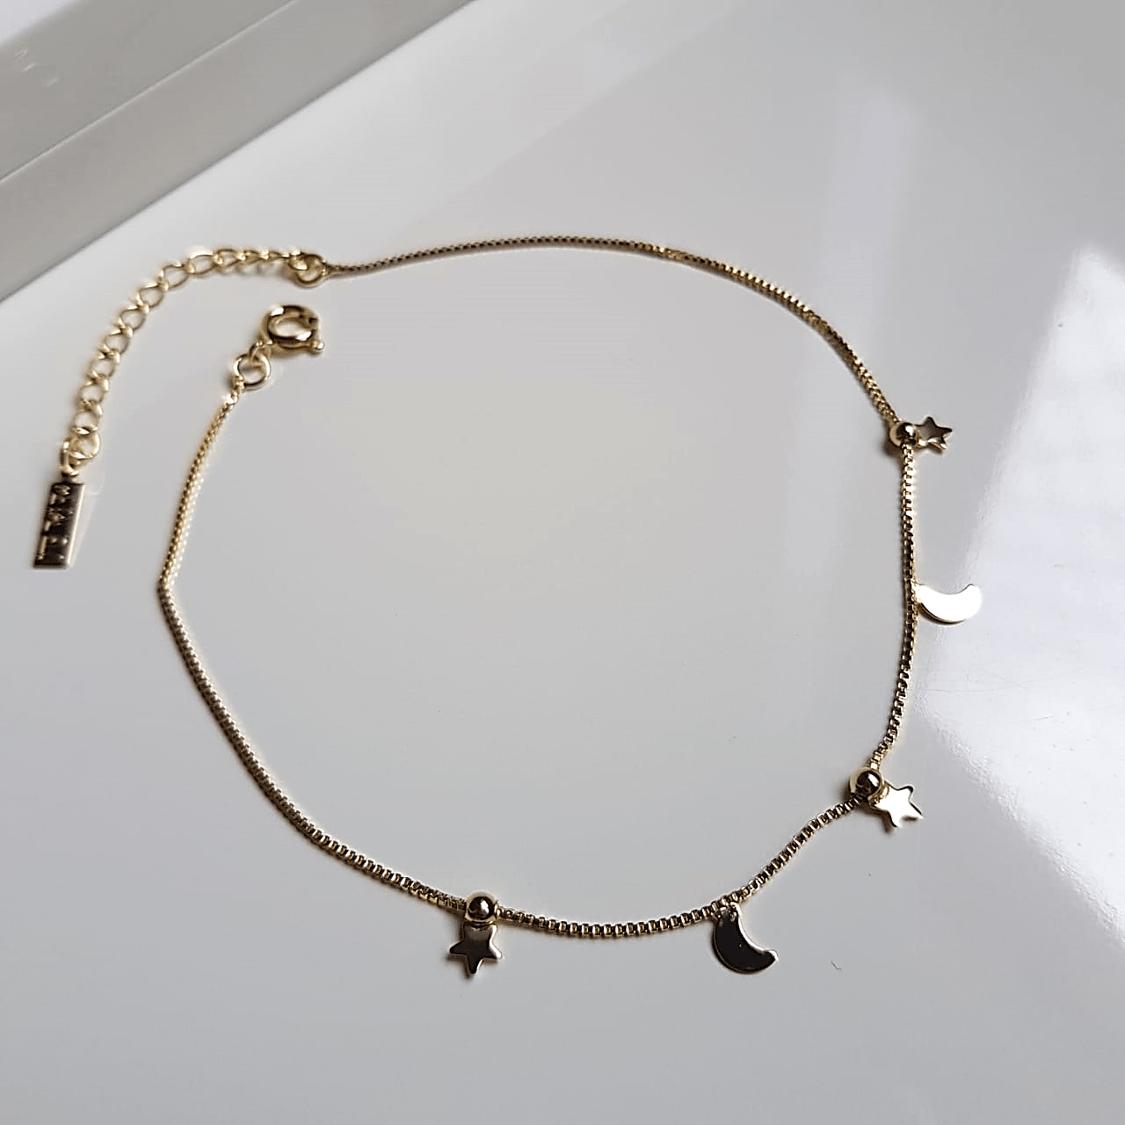 Tornozeleira dourada - 4